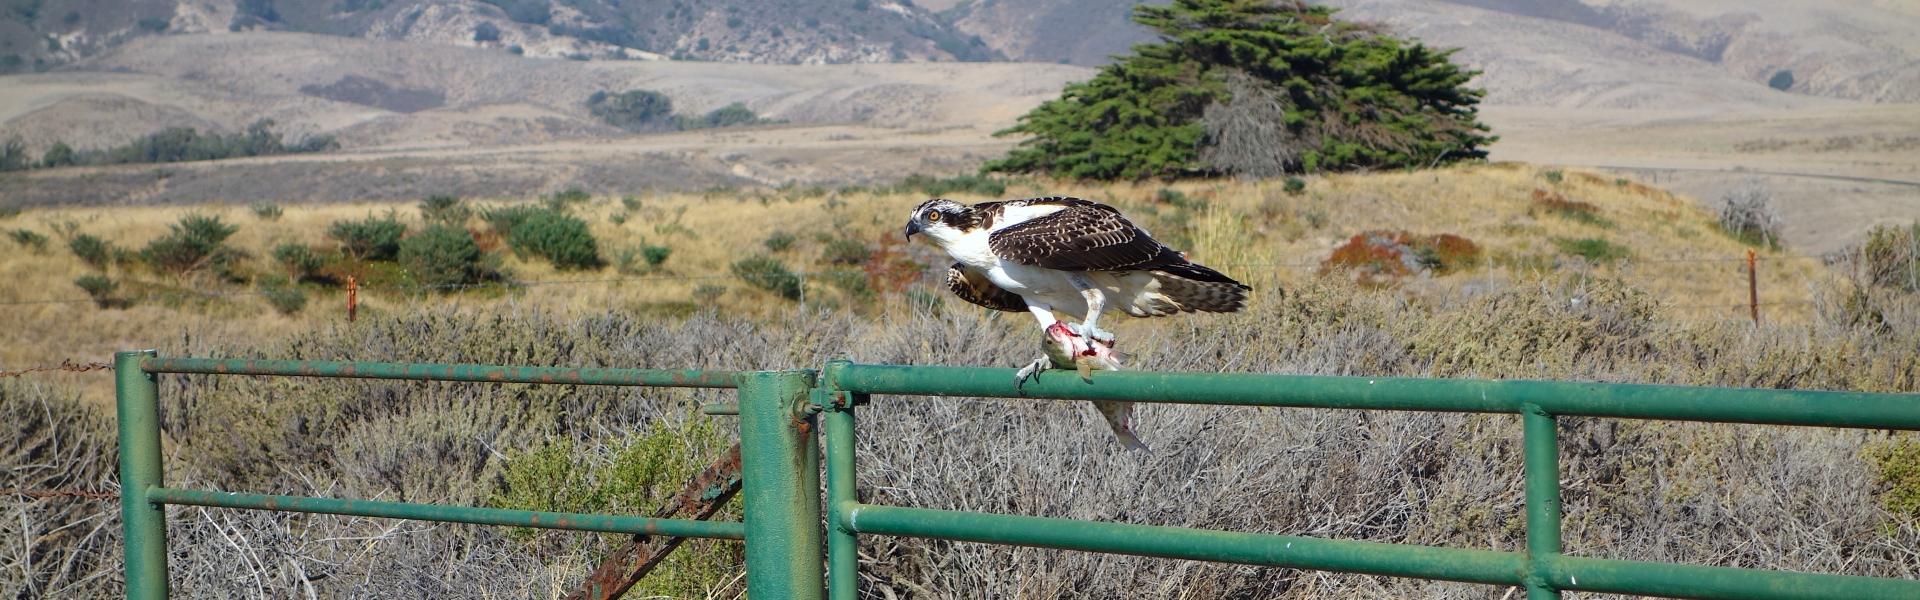 Osprey bird sits on metal fence